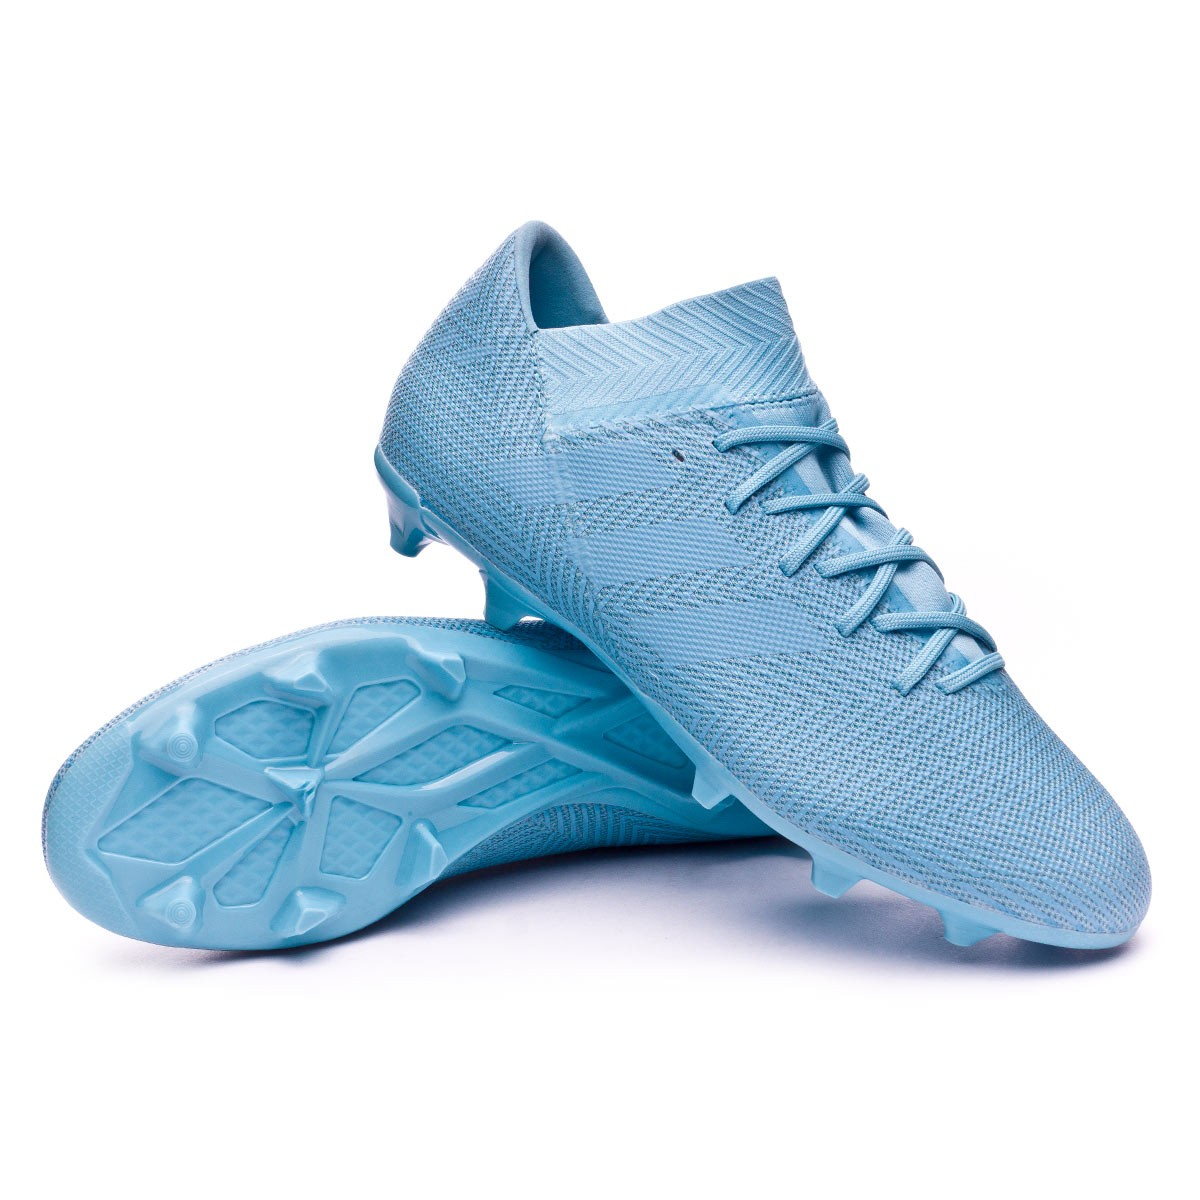 ec34d5652147 Football Boots adidas Nemeziz Messi 18.3 FG Ash blue-Raw grey ...